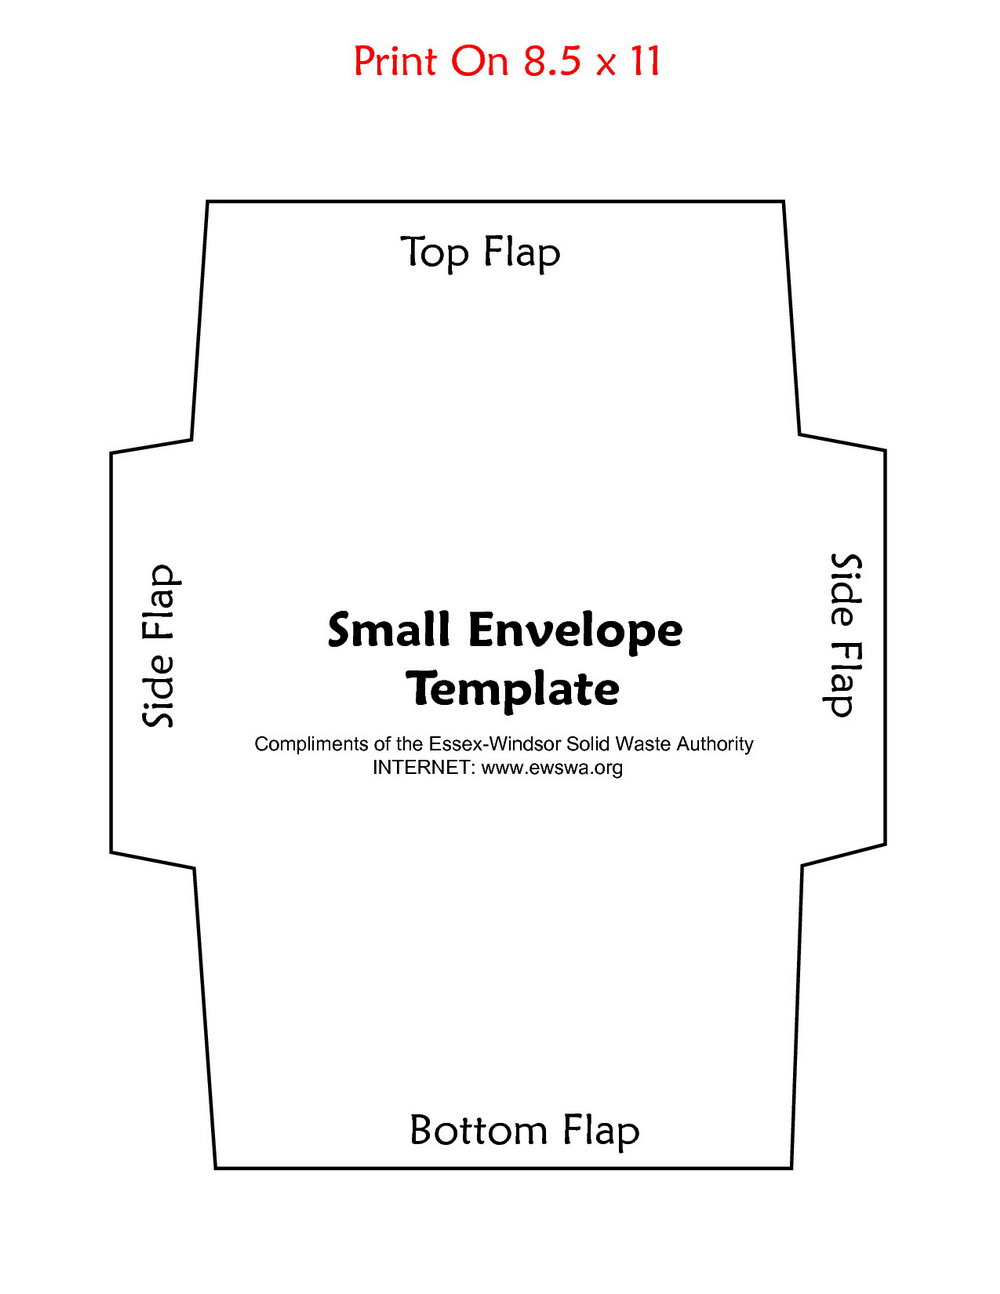 Envelope Printing Template Wordpad